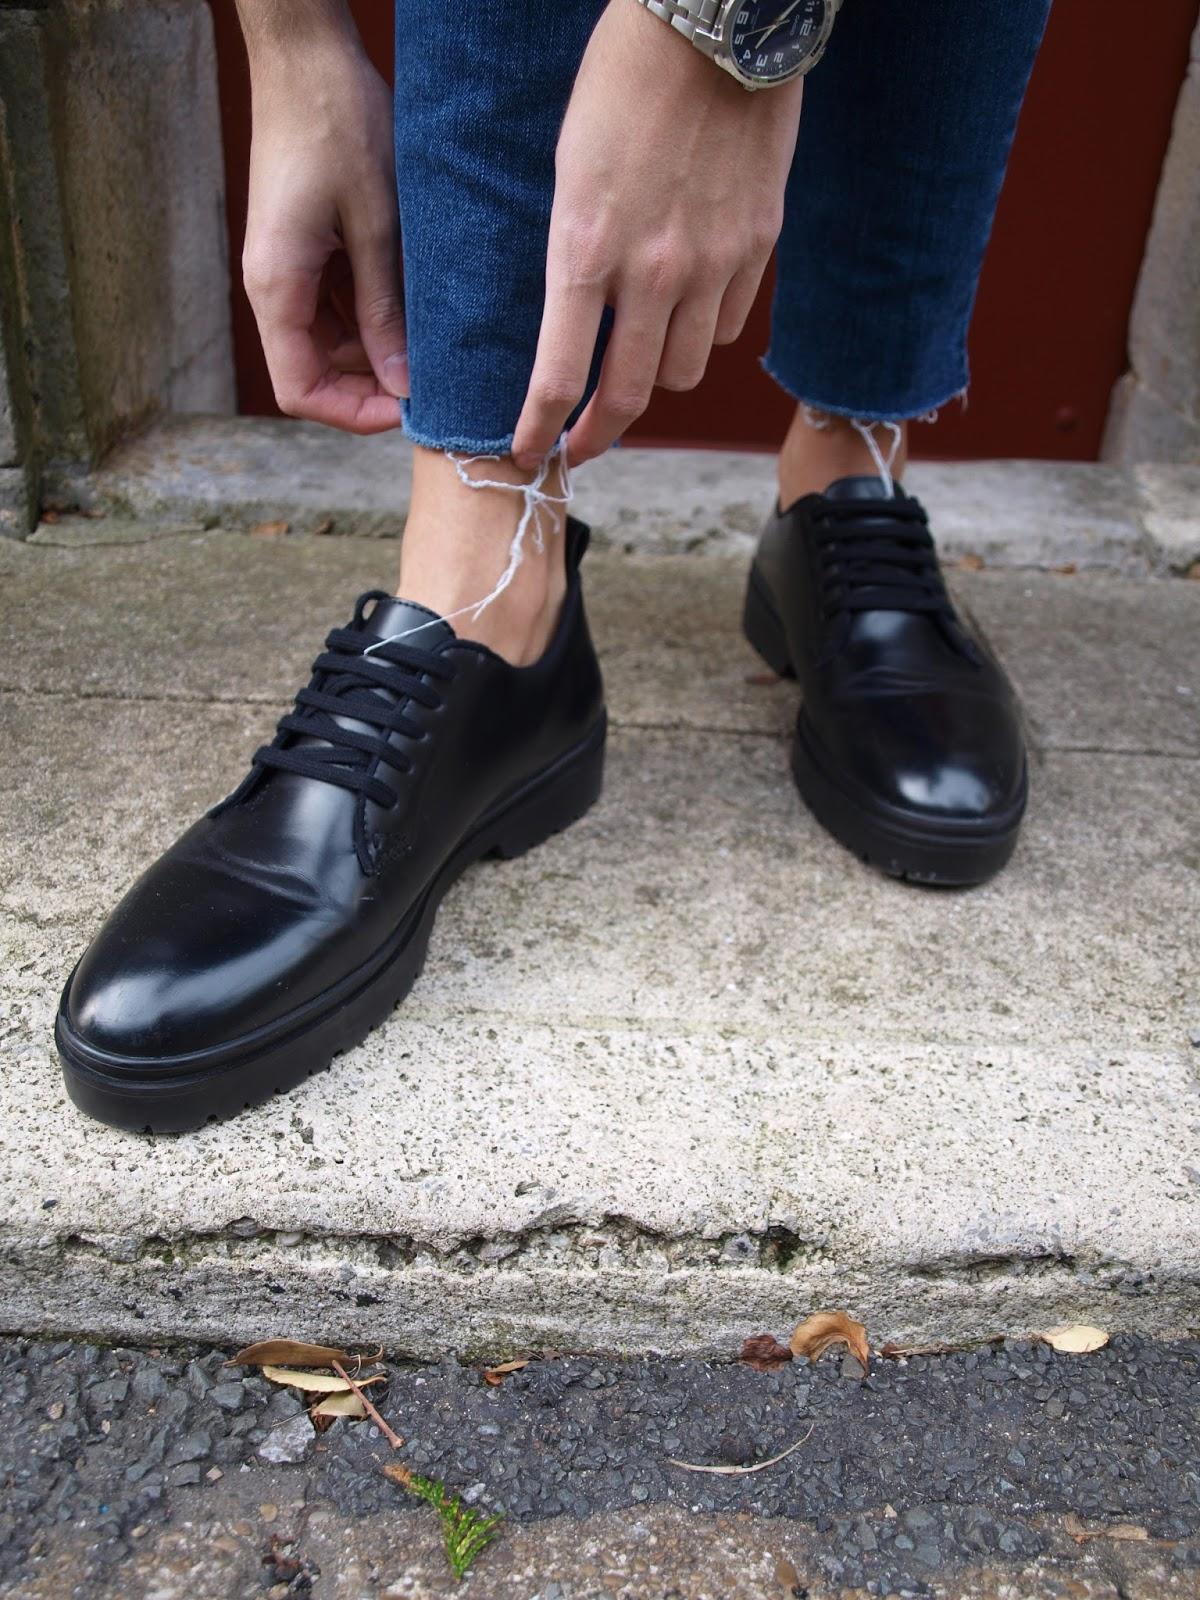 suede-x-black-coastalandco-hendaye-blog-blogger-diam-jacket-veste-komono-outfit-vintage-zara-portdecaneta-fashion